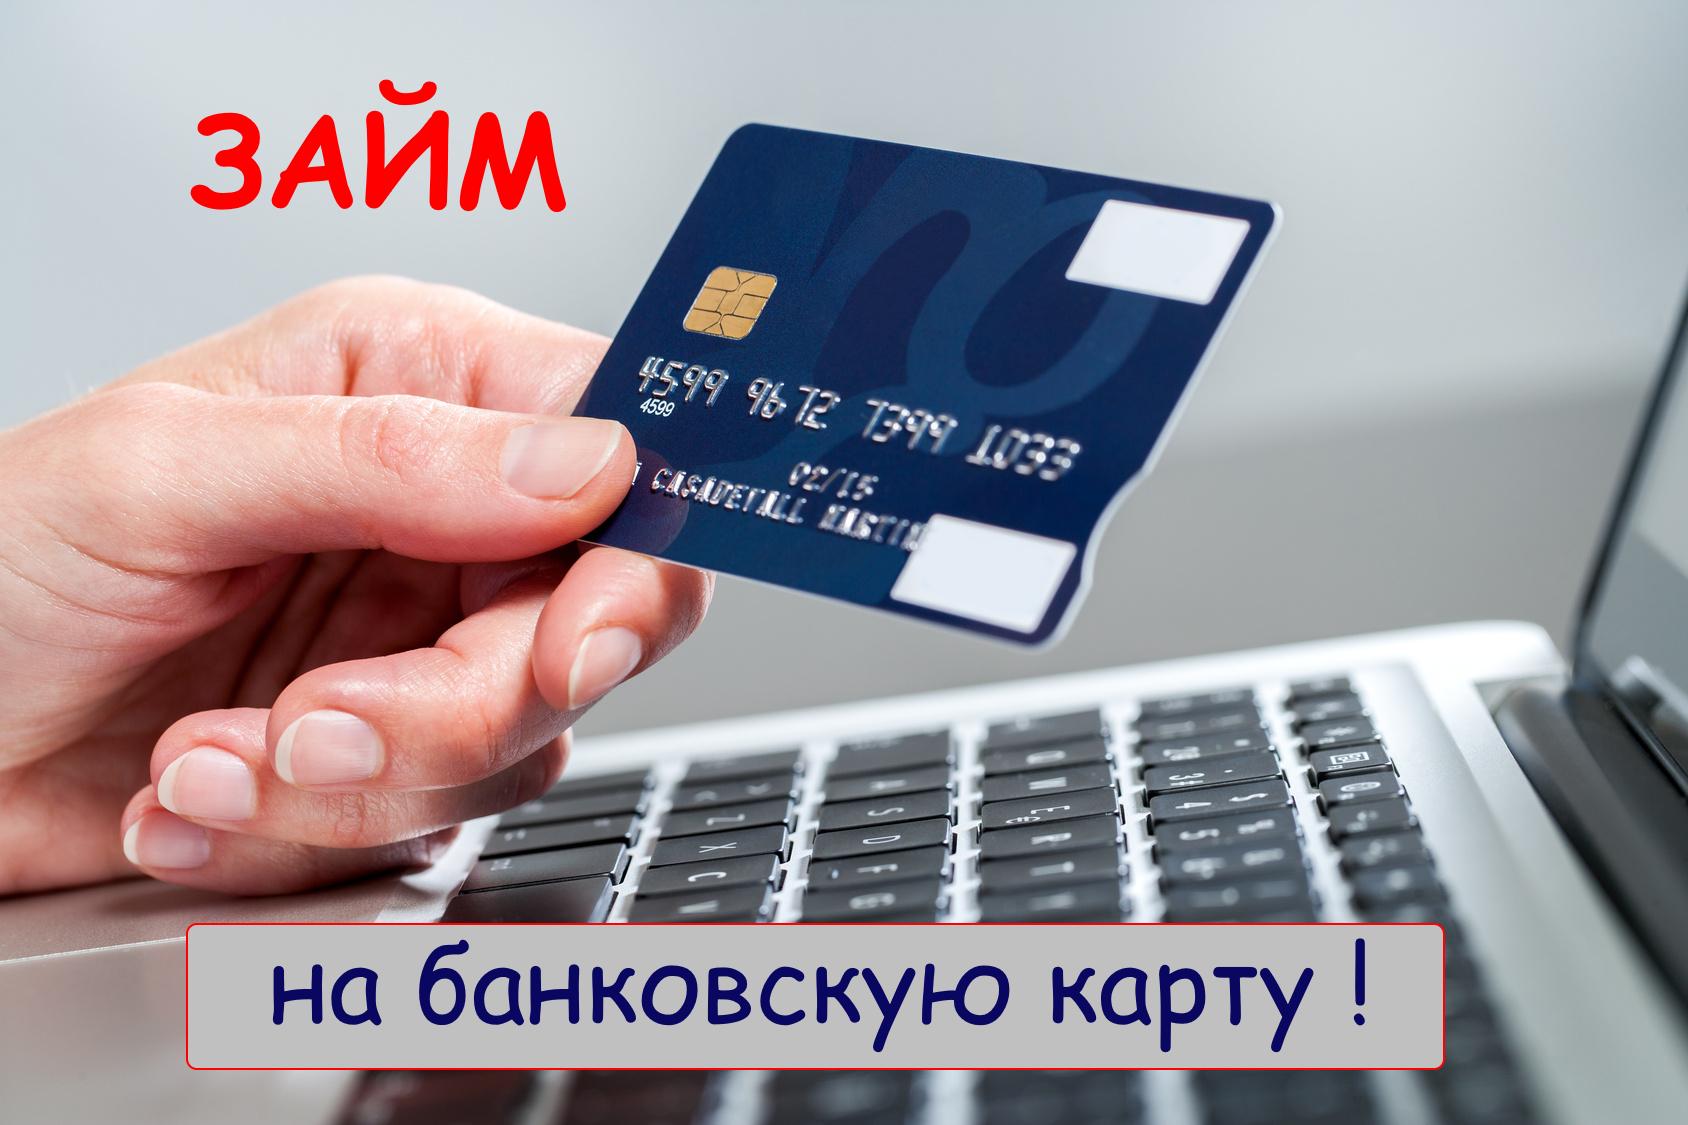 кредит банке кредитную карту онлайн